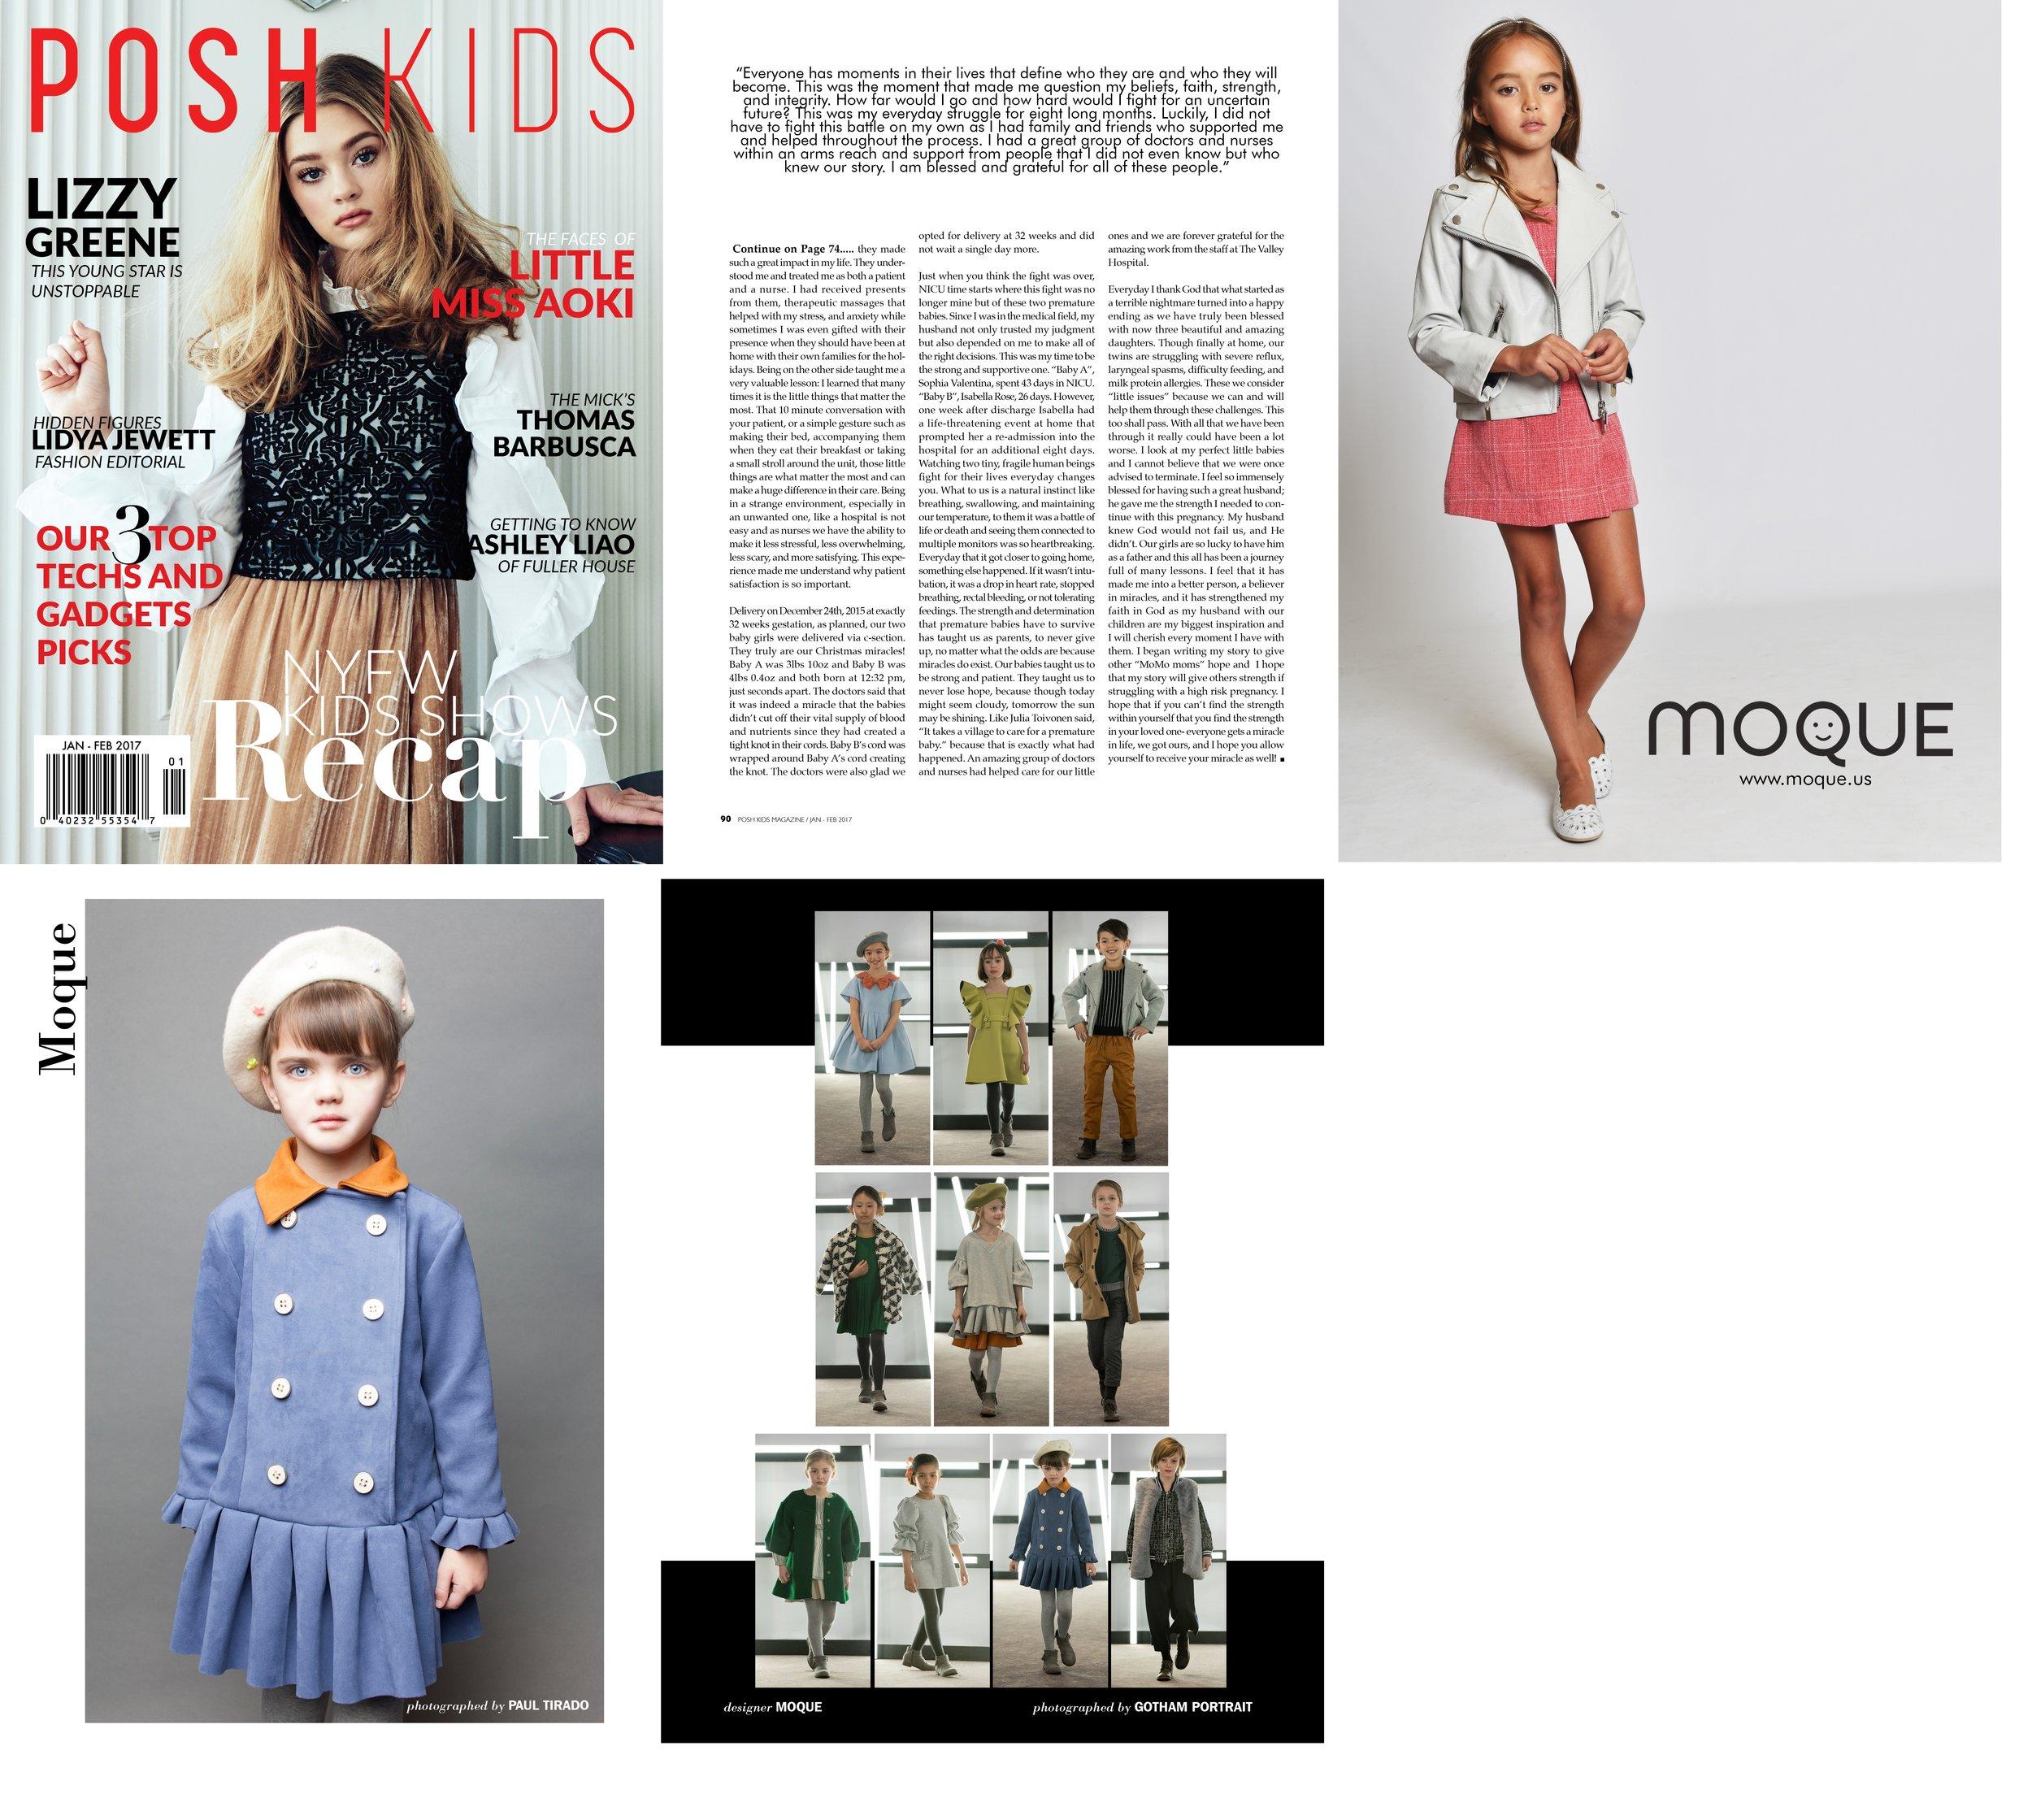 POSH KIDS LIZZY GREENE ISSUE - .jpg